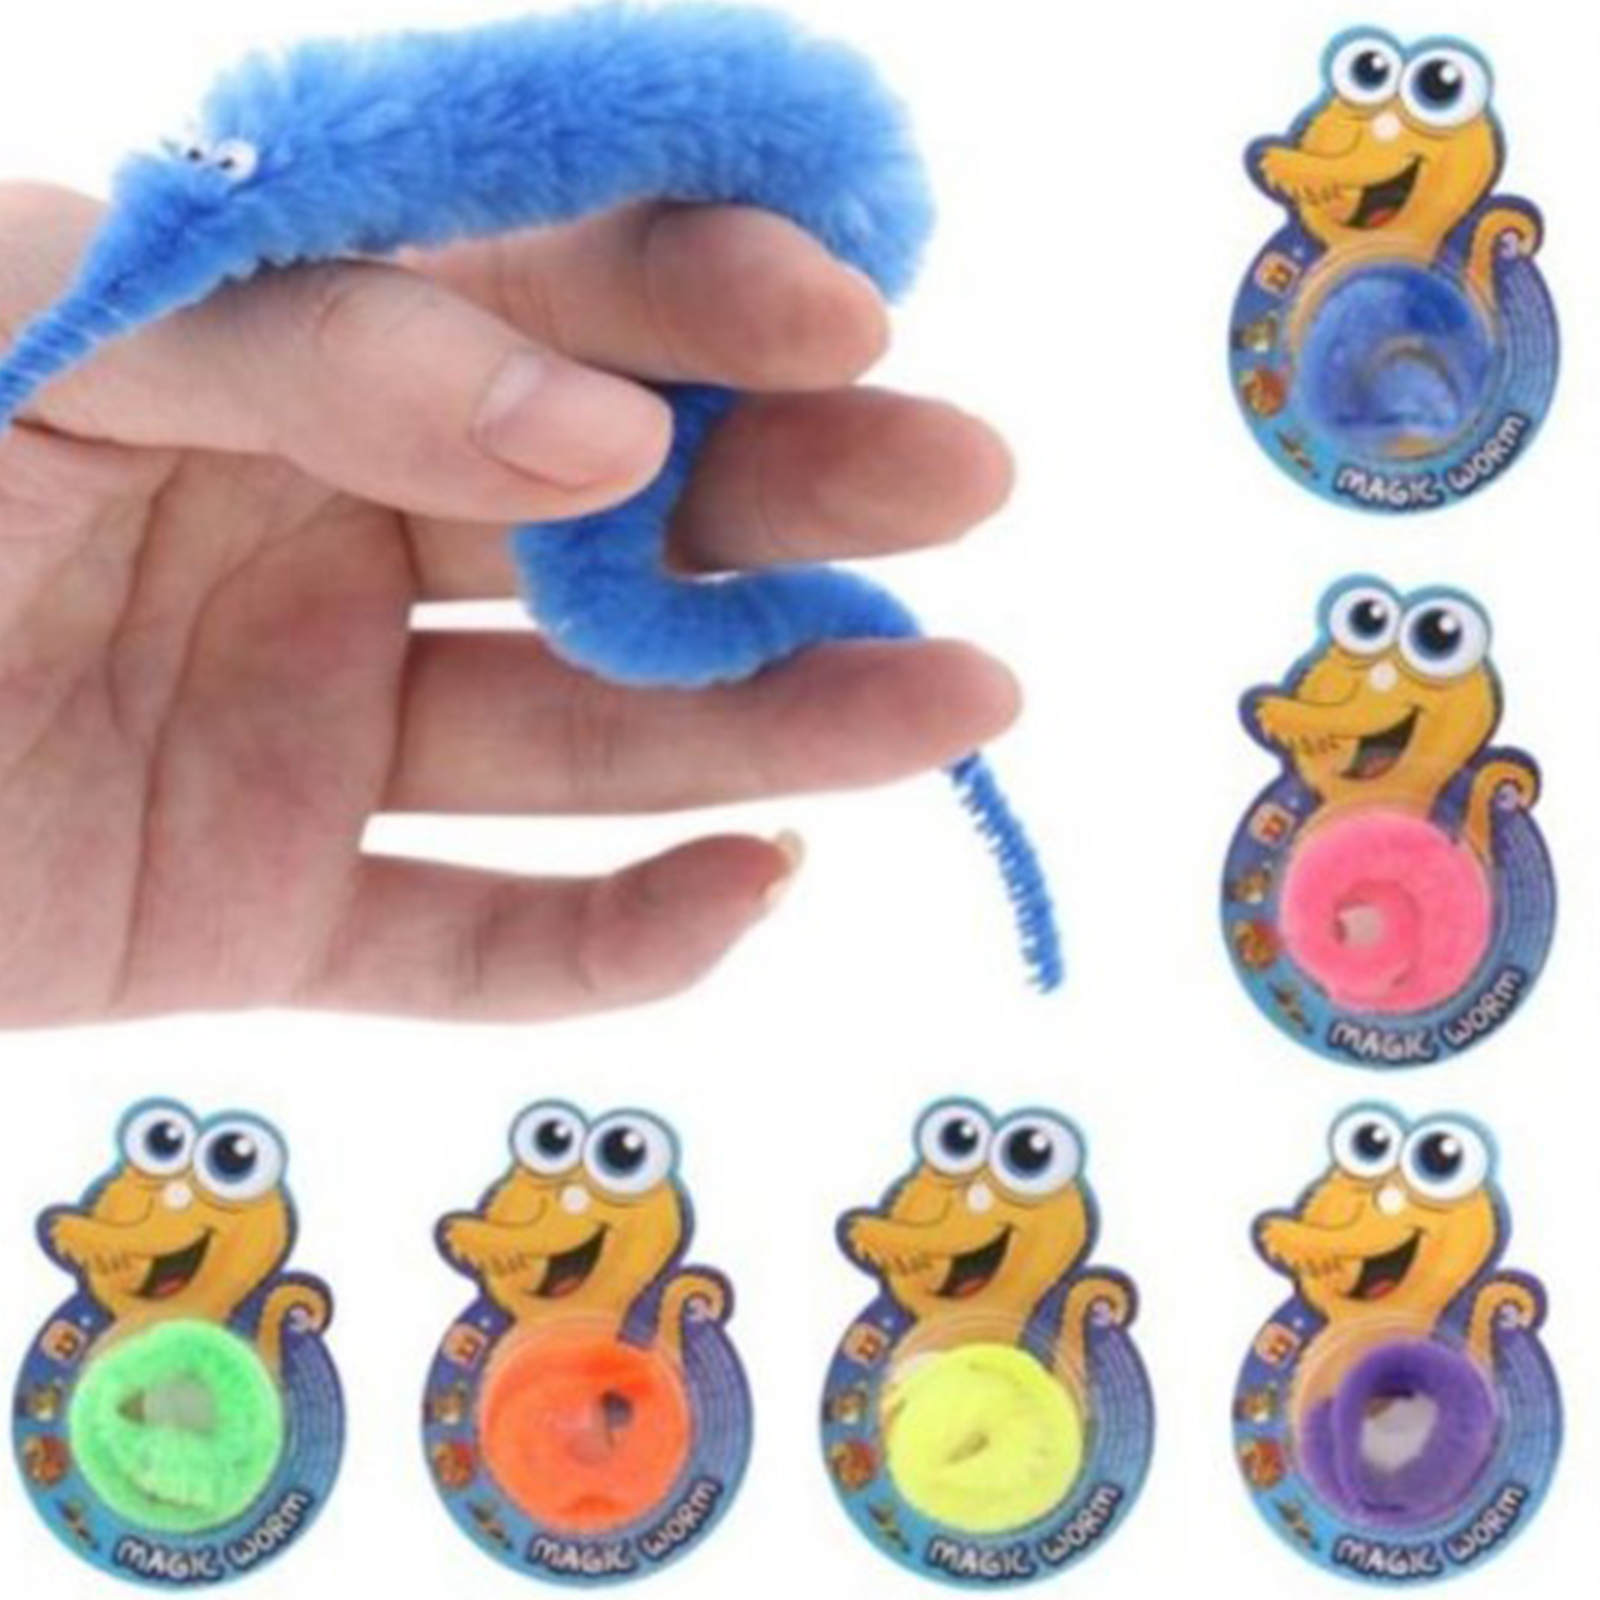 US $0 11 OFF 1Pcs OPP Bag Packing Magic Trick Twisty Fuzzy Worm Kids Cartoon Animals Toys Bile Pussy Mr Fuzzy Dolls Magic Tricks AliExpress